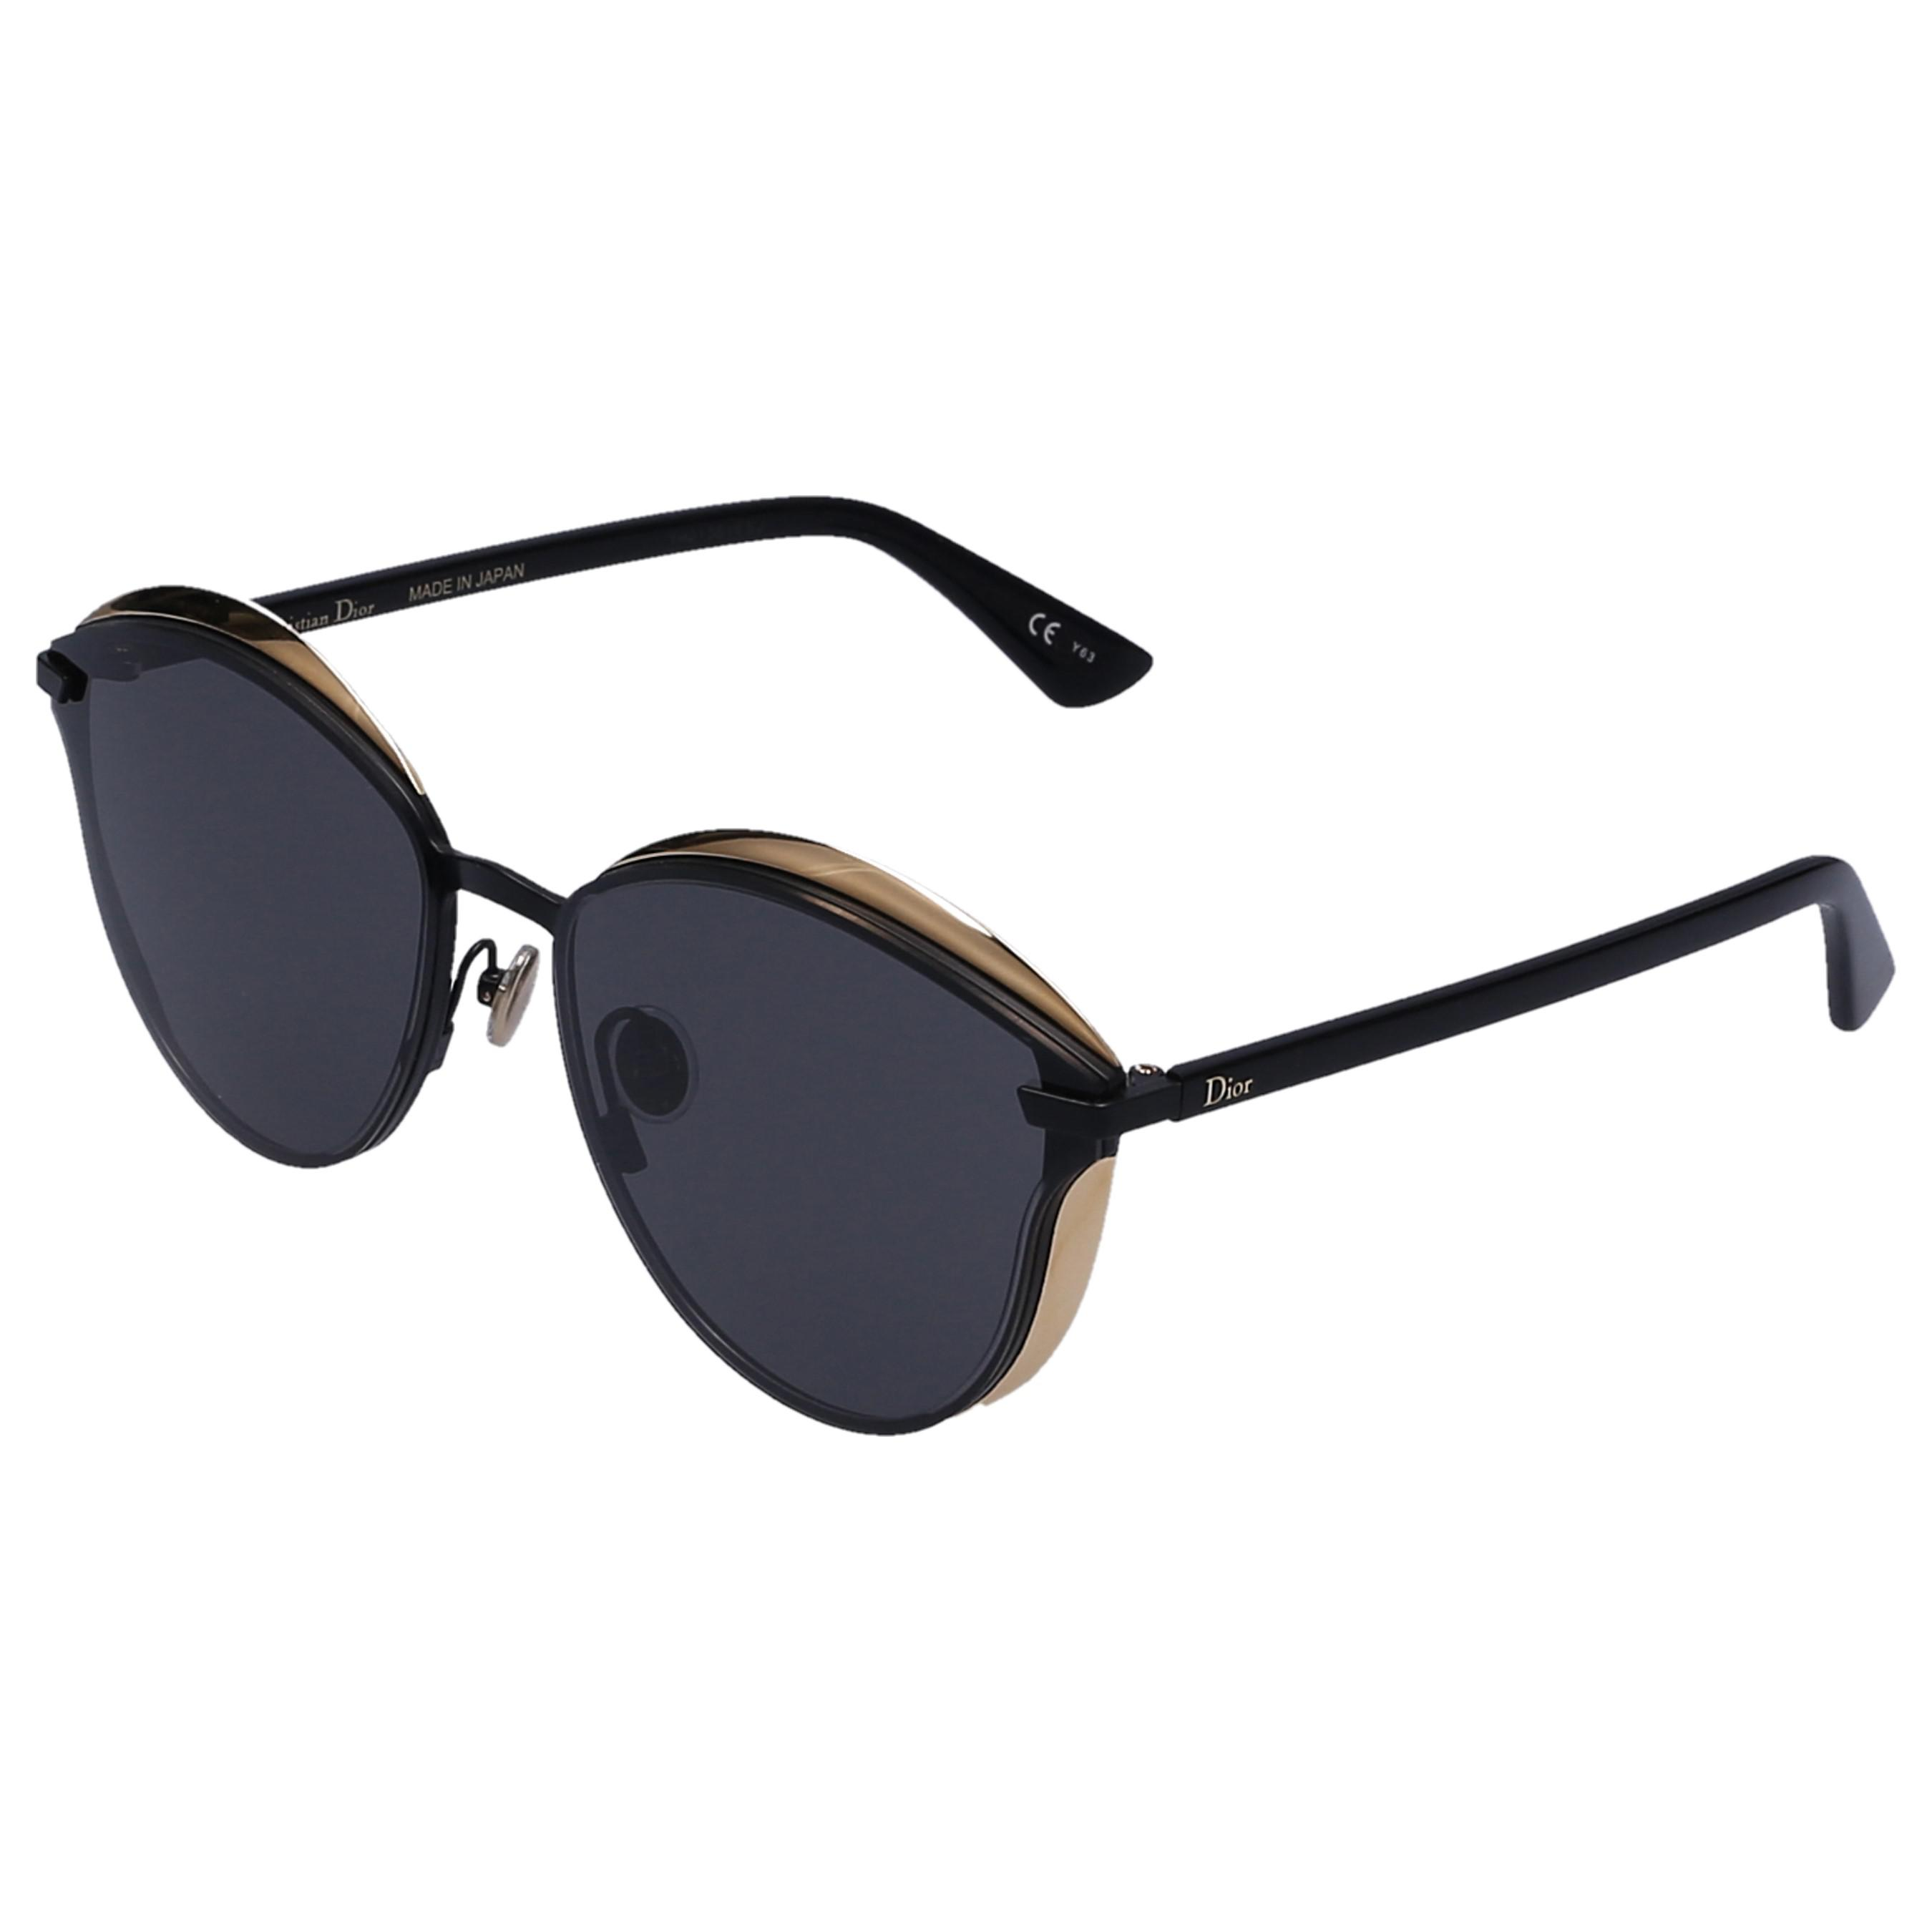 e34aa39e26 Dior - Blue Sunglasses Cat Eye Murmur Acetate Black - Lyst. View fullscreen